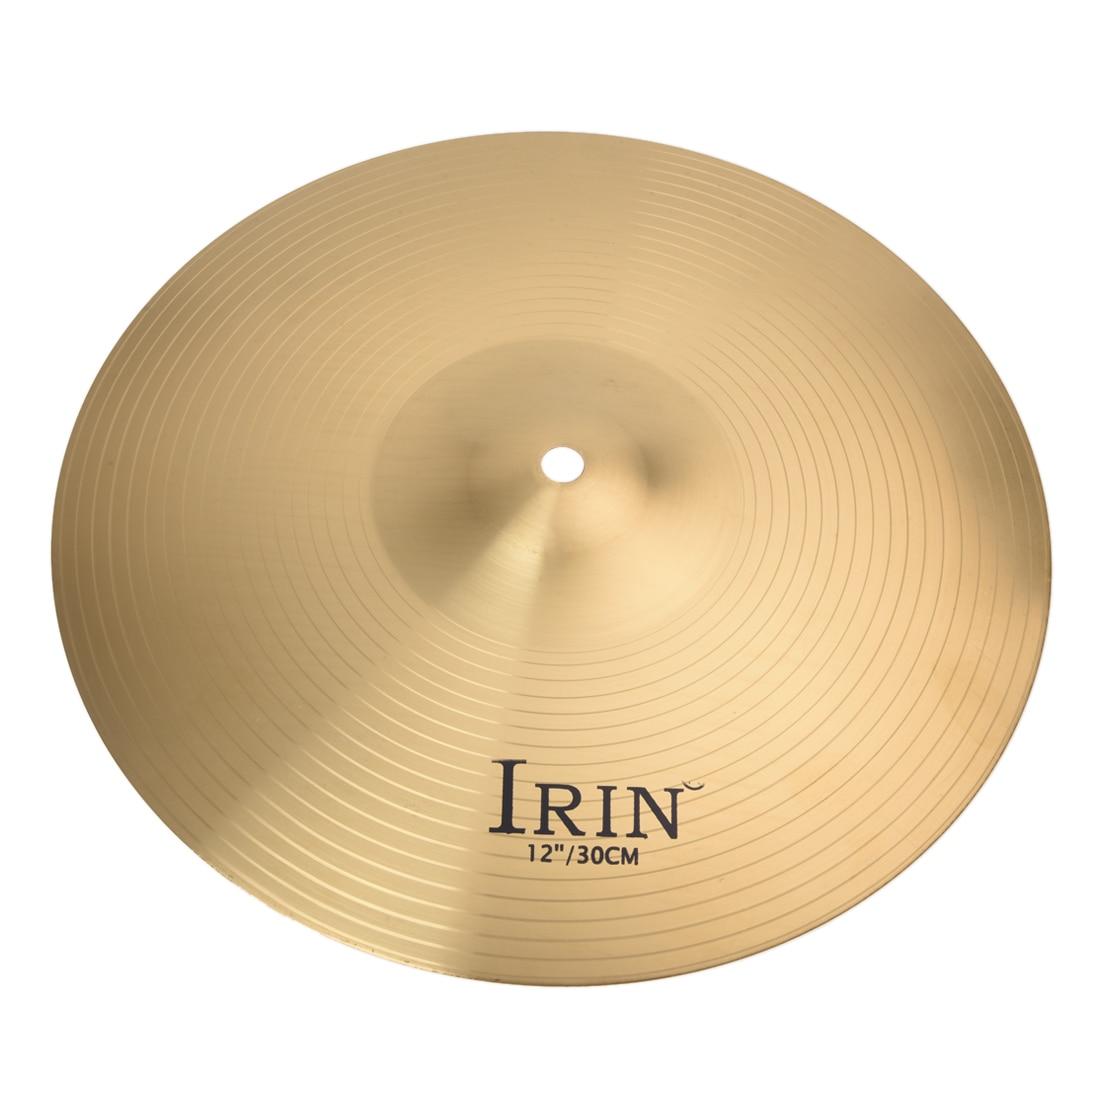 high quality 12 brass crash ride hi hat cymbals box drum set professional s2k1